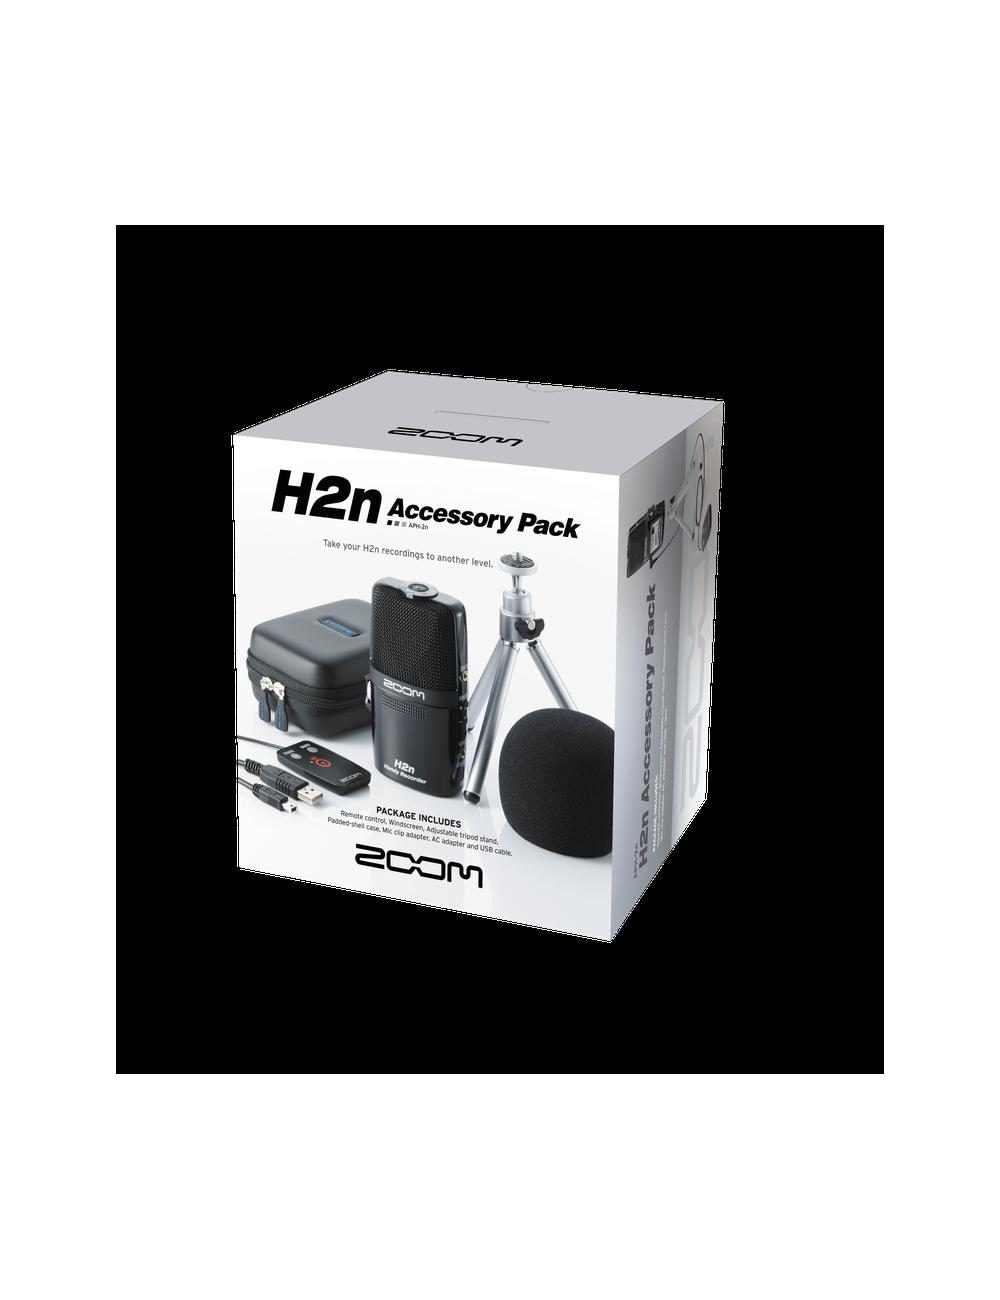 Capsula stereo Zoom Iq7 para Iphone, Ipad o Ipod Micrófono Condensador X/Y